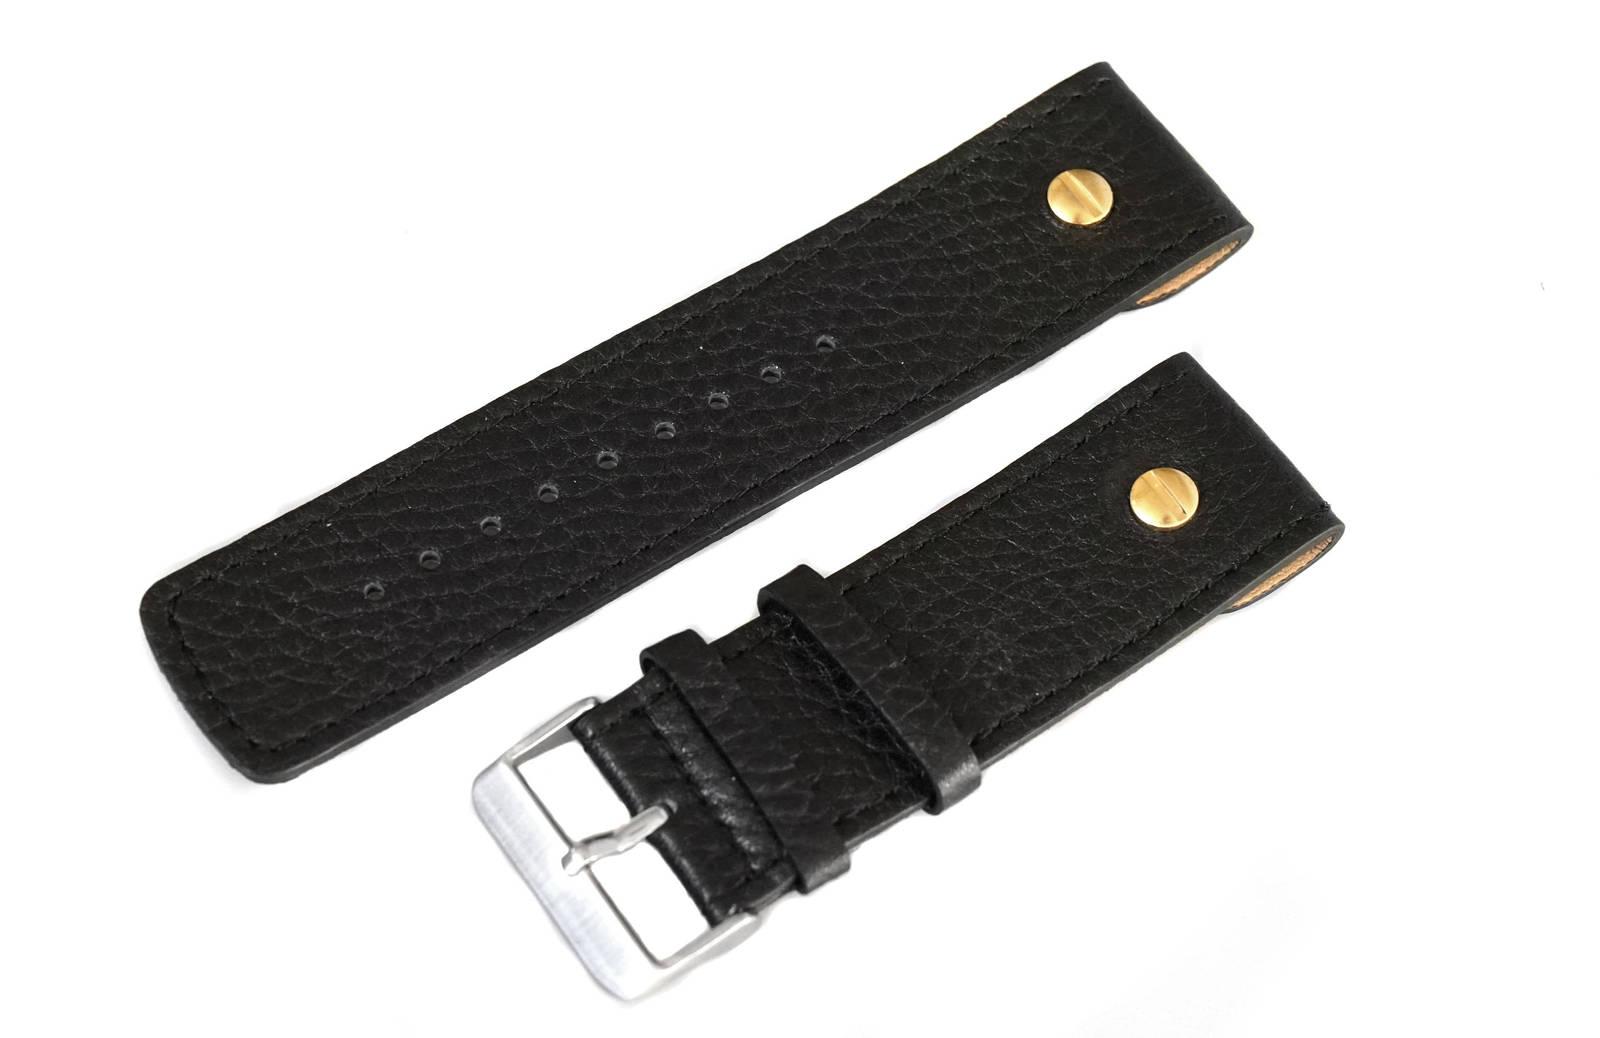 26mm Leather Watch Strap Band with Silver Buckle for Diesel DZ2015-DZ1129-DZ1198